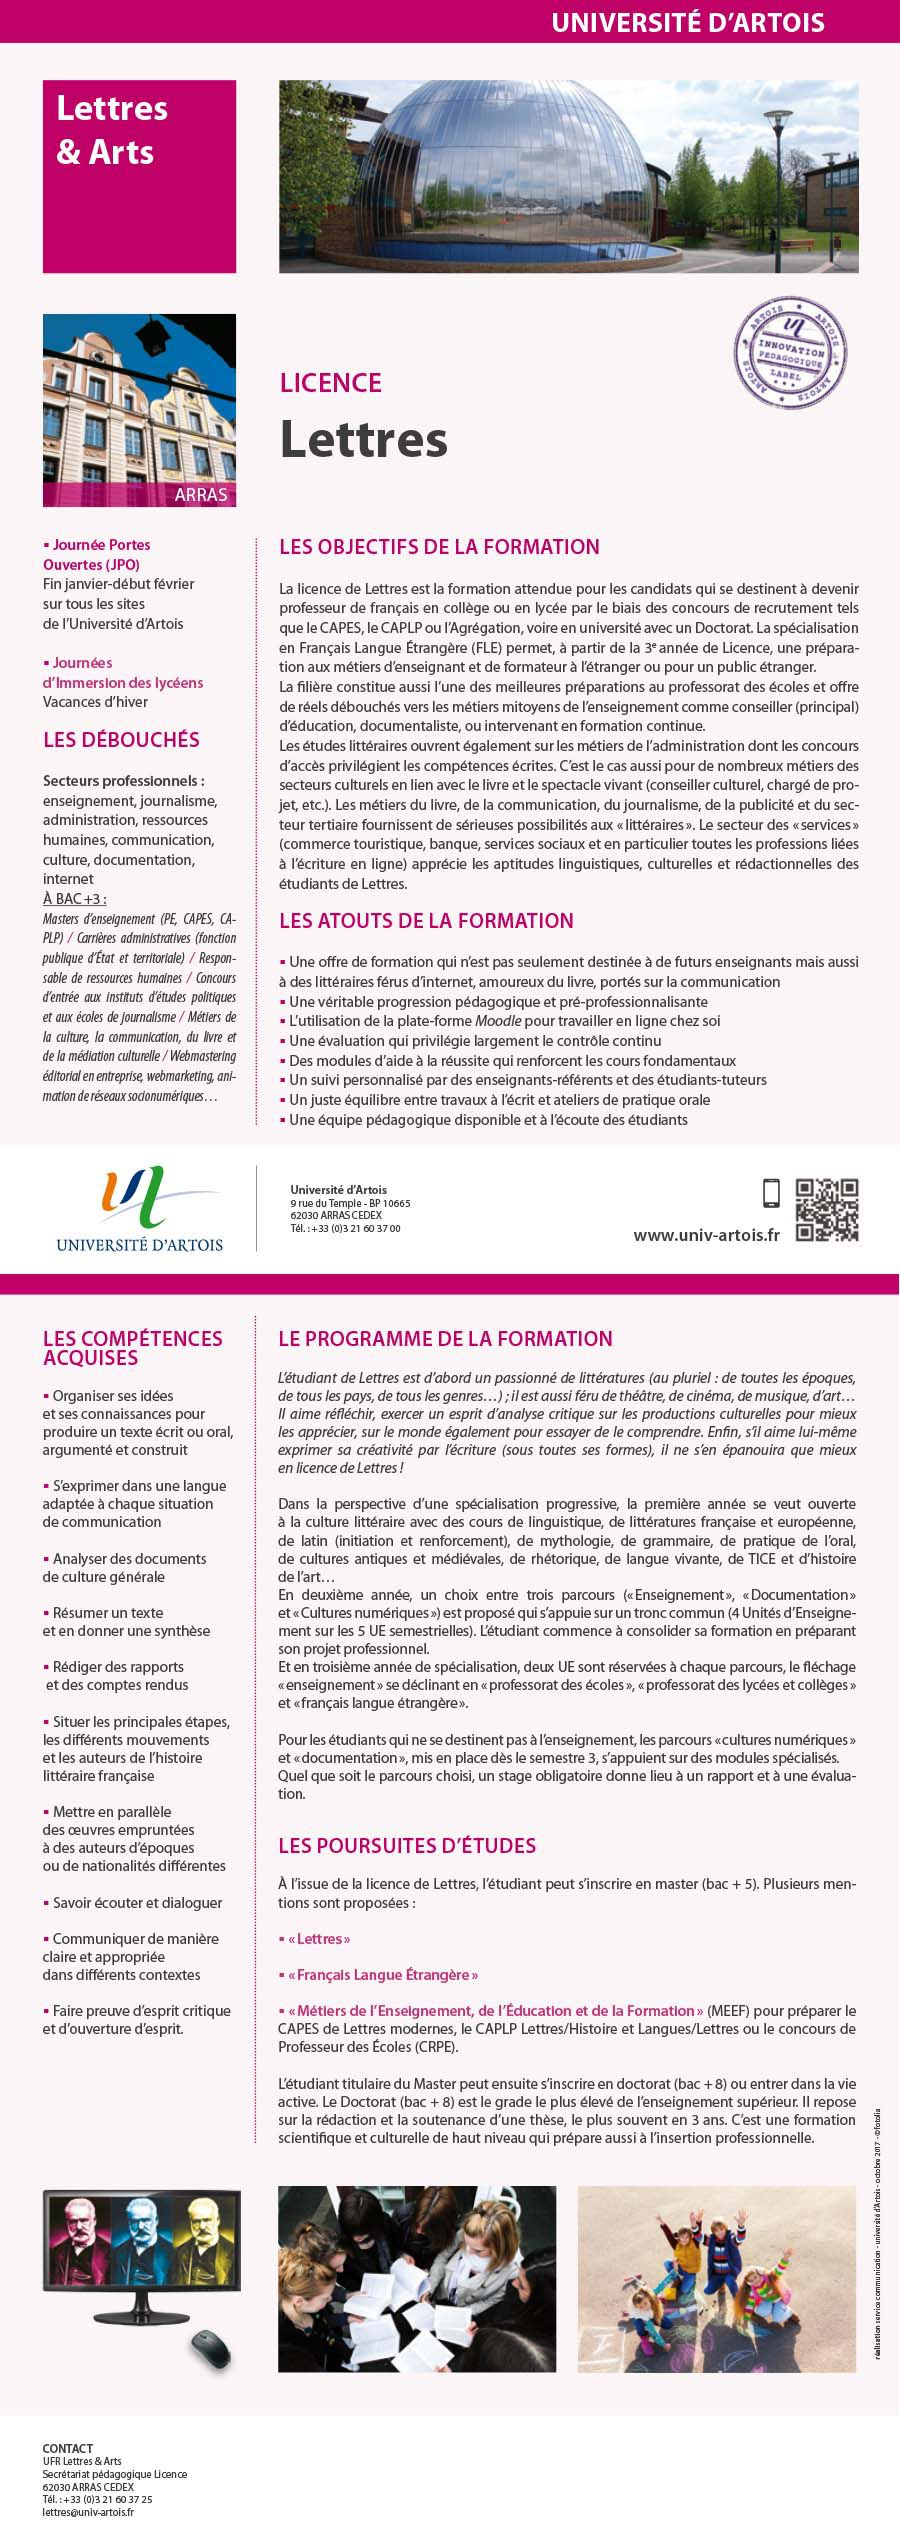 Licence Lettres modernes - Enseignement collège et lycée